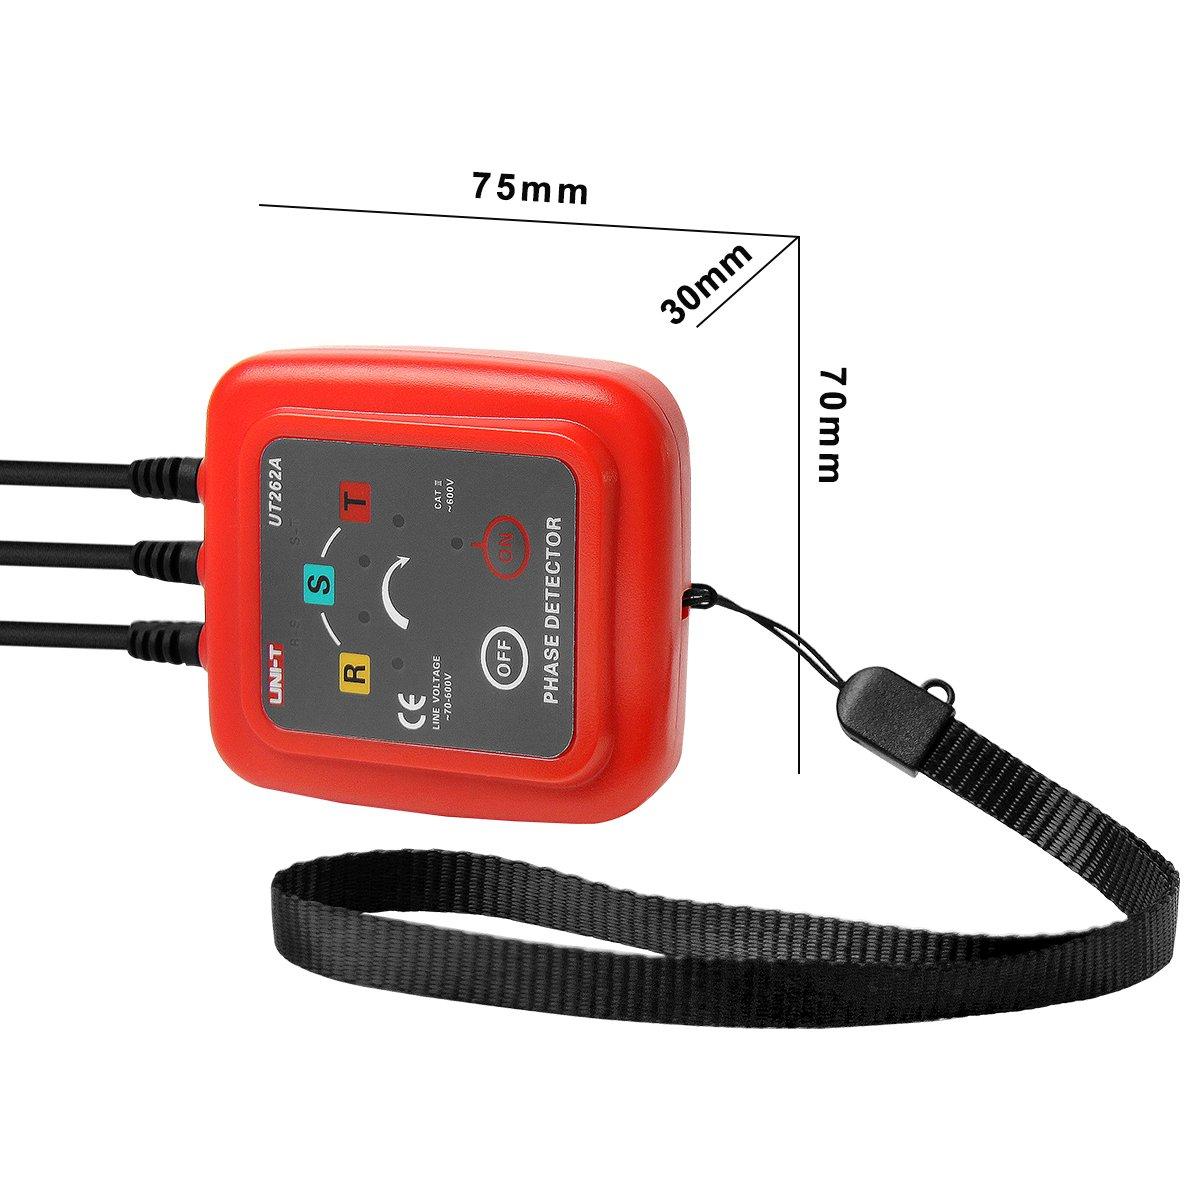 UNI-T UT262A 3 Detector de Secuencia de Fase Rotación de Secuencia de Fase Detectores Indicador Tester Medidor LED Zumbador: Amazon.es: Electrónica